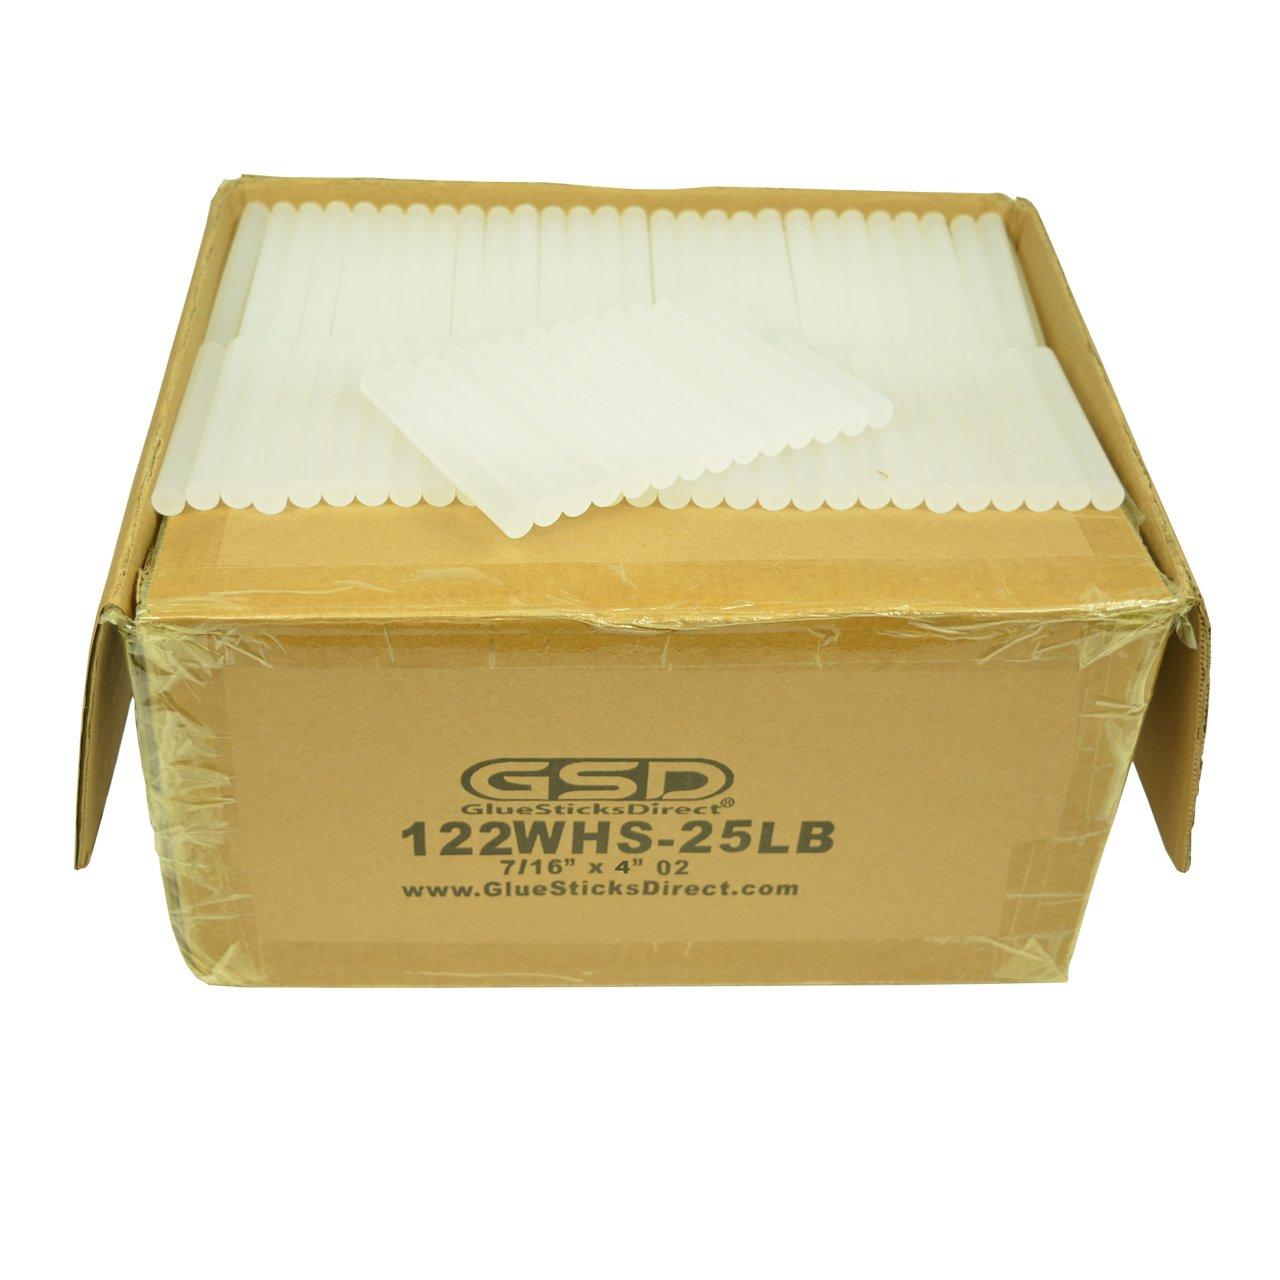 Wholesale Hot Melt Glue Sticks 7/16'' X 4'' 25 lbs bulk